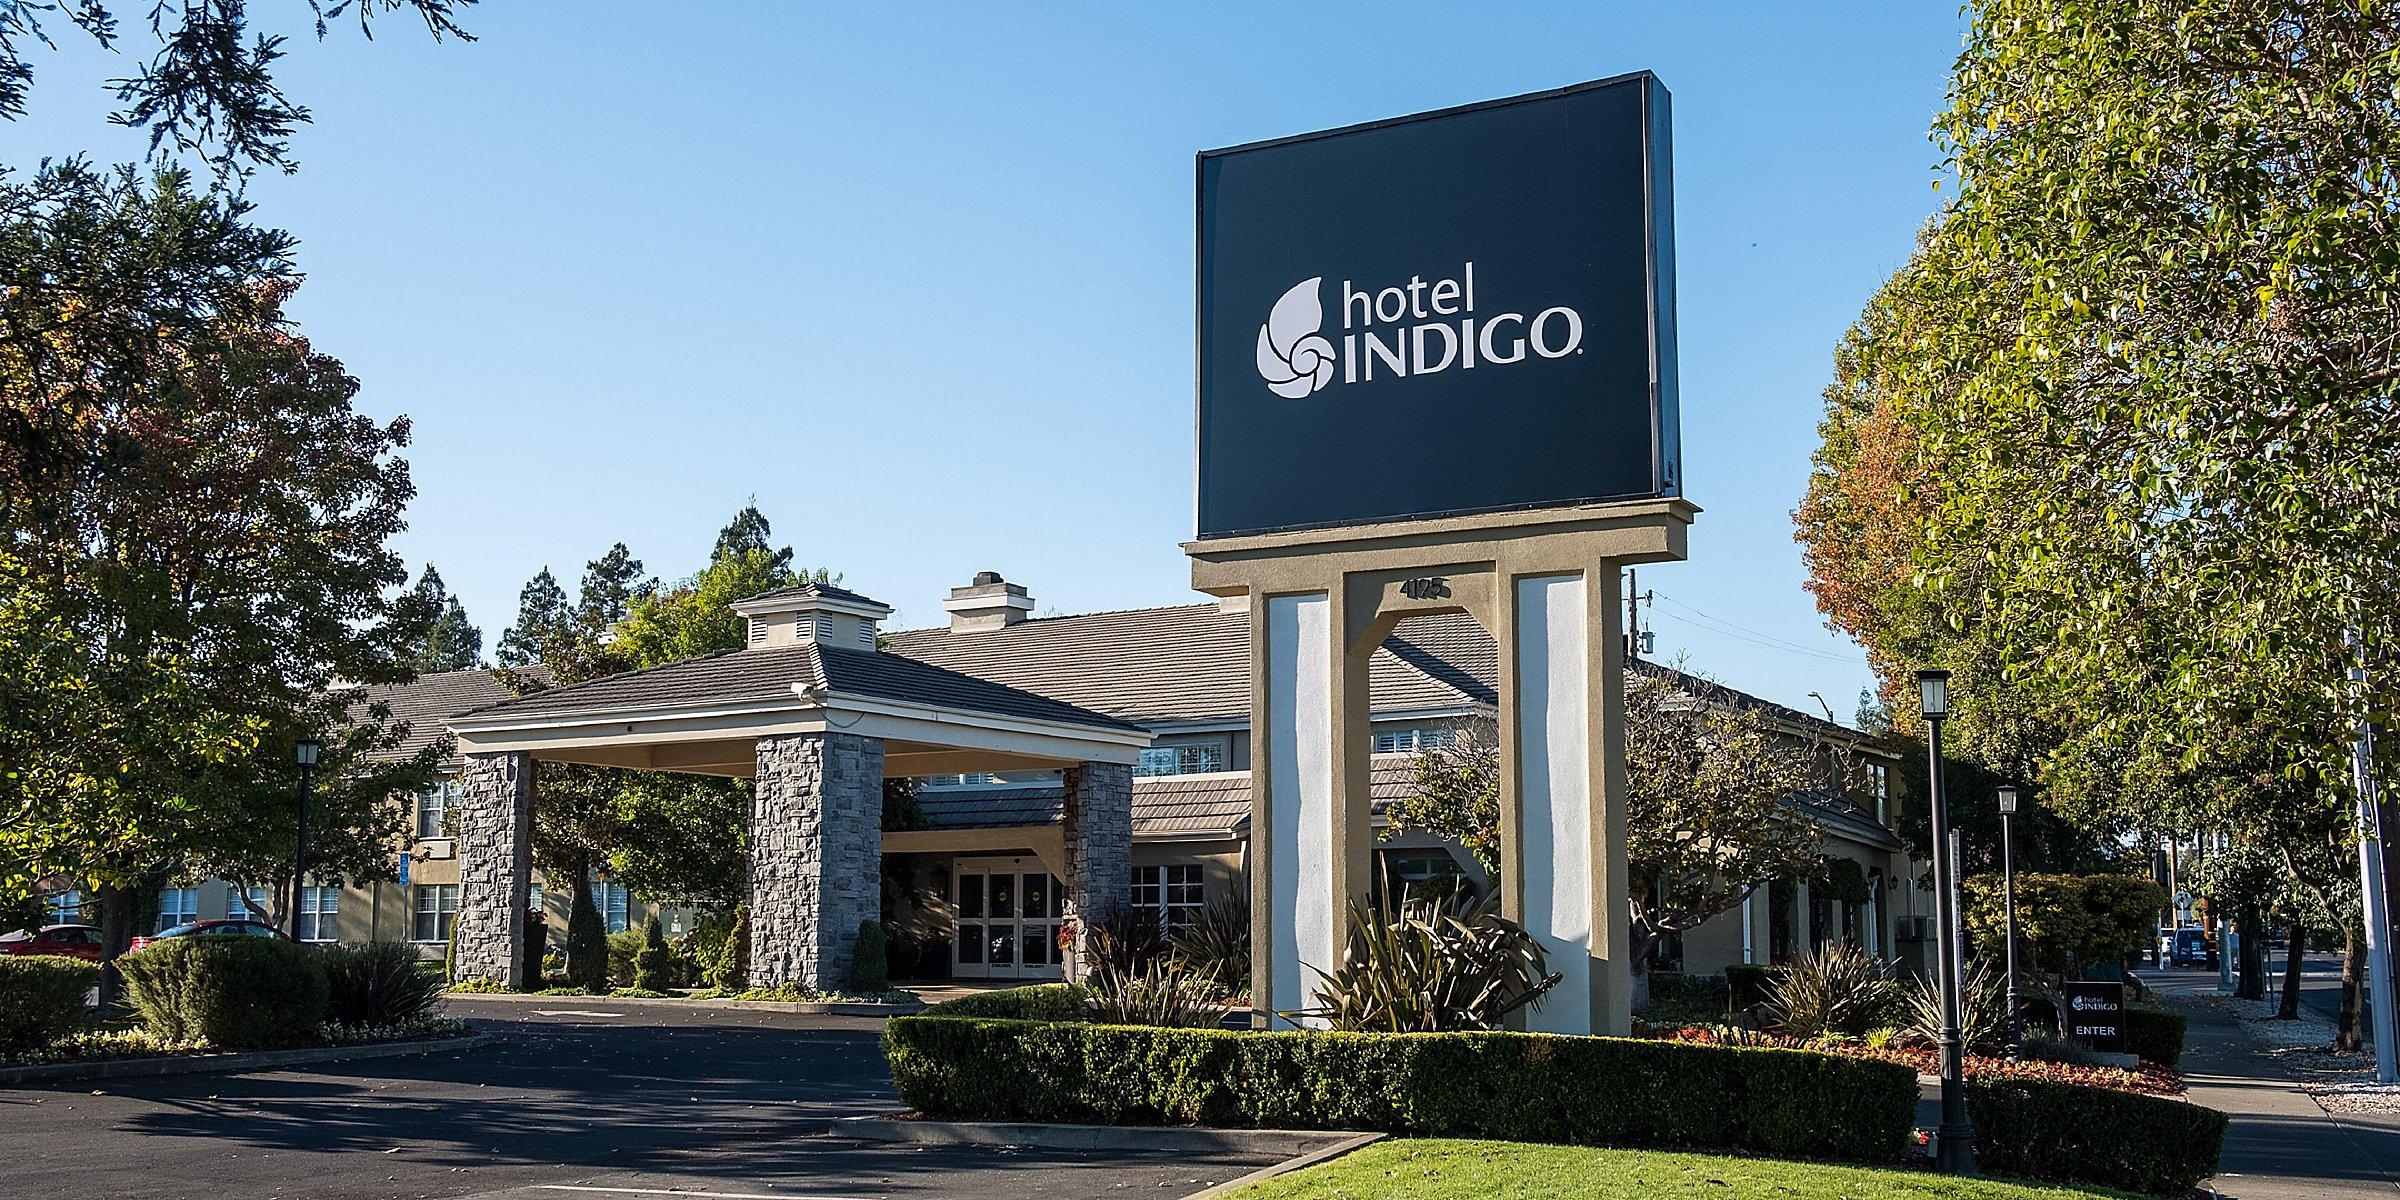 Napa Valley Hotels >> Napa Hotels Hotel Indigo Napa Valley Hotel In Napa California